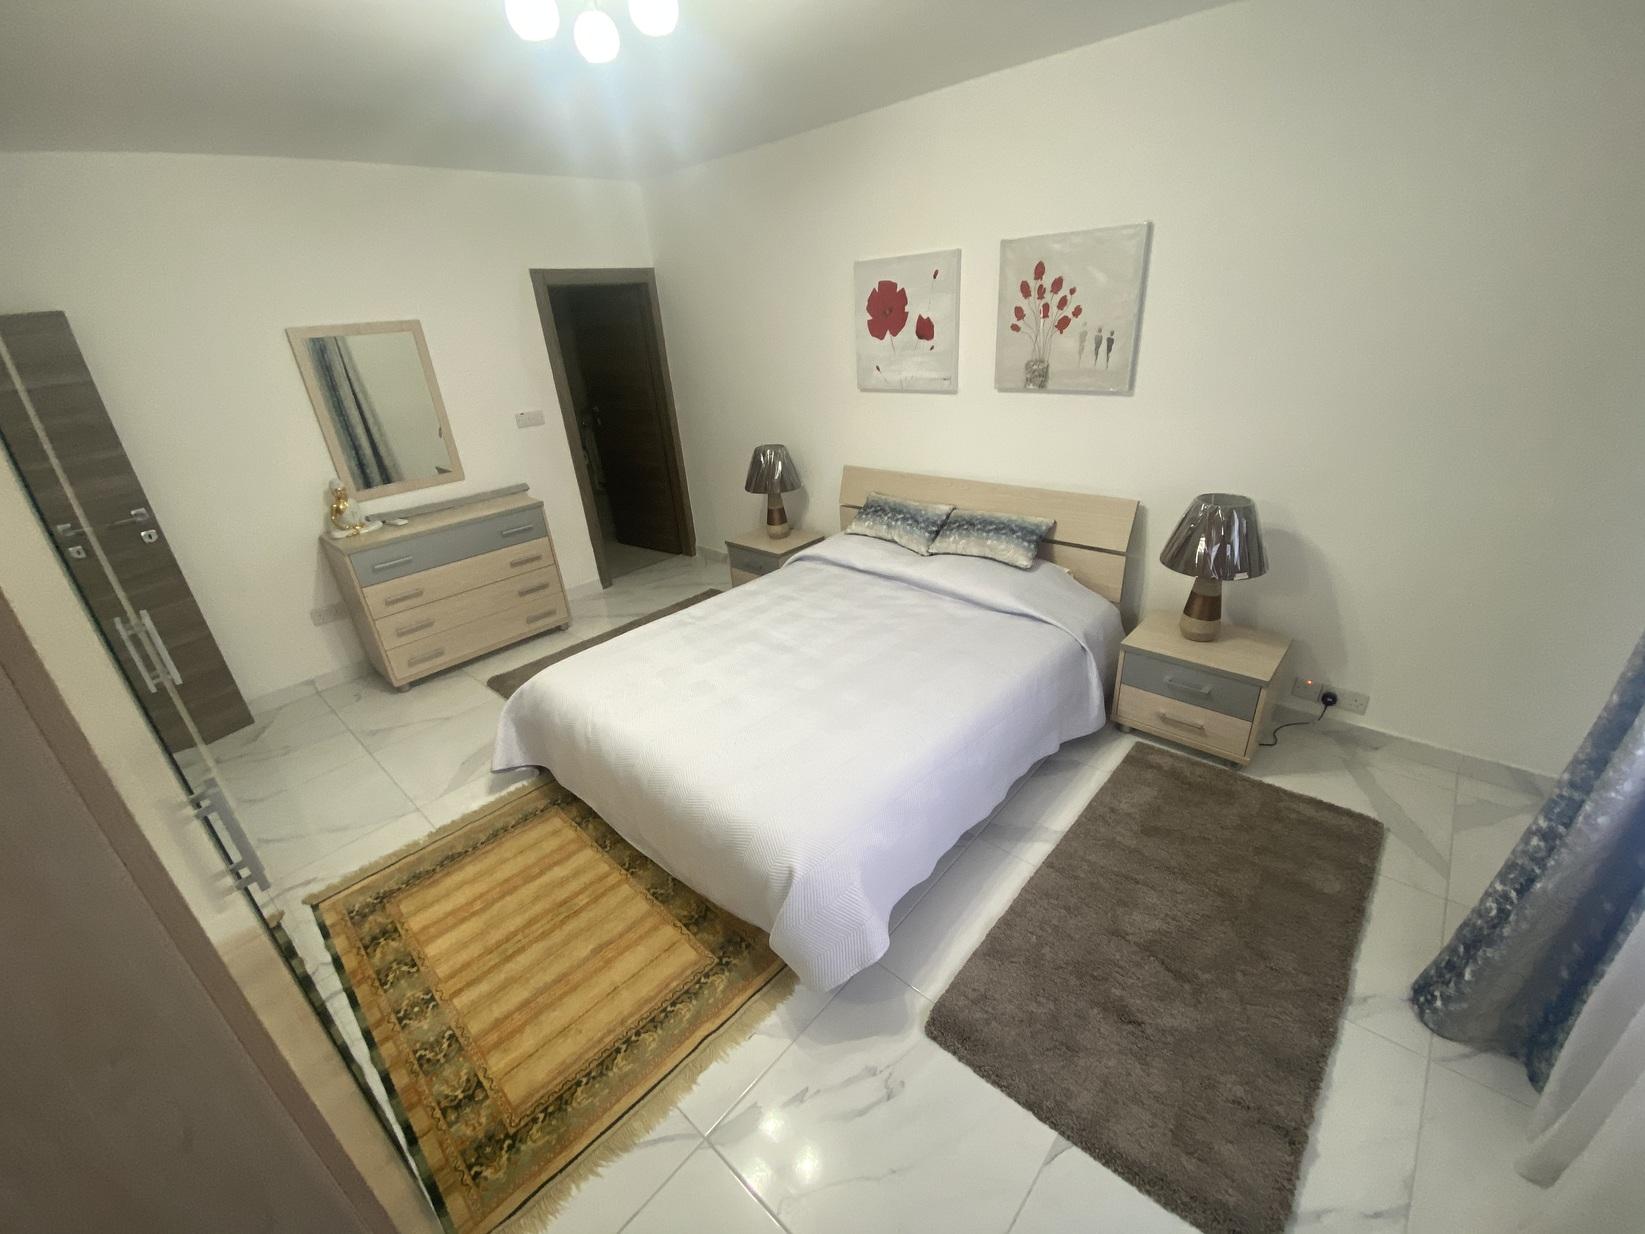 3 bed Apartment For Rent in Qawra, Qawra - thumb 15